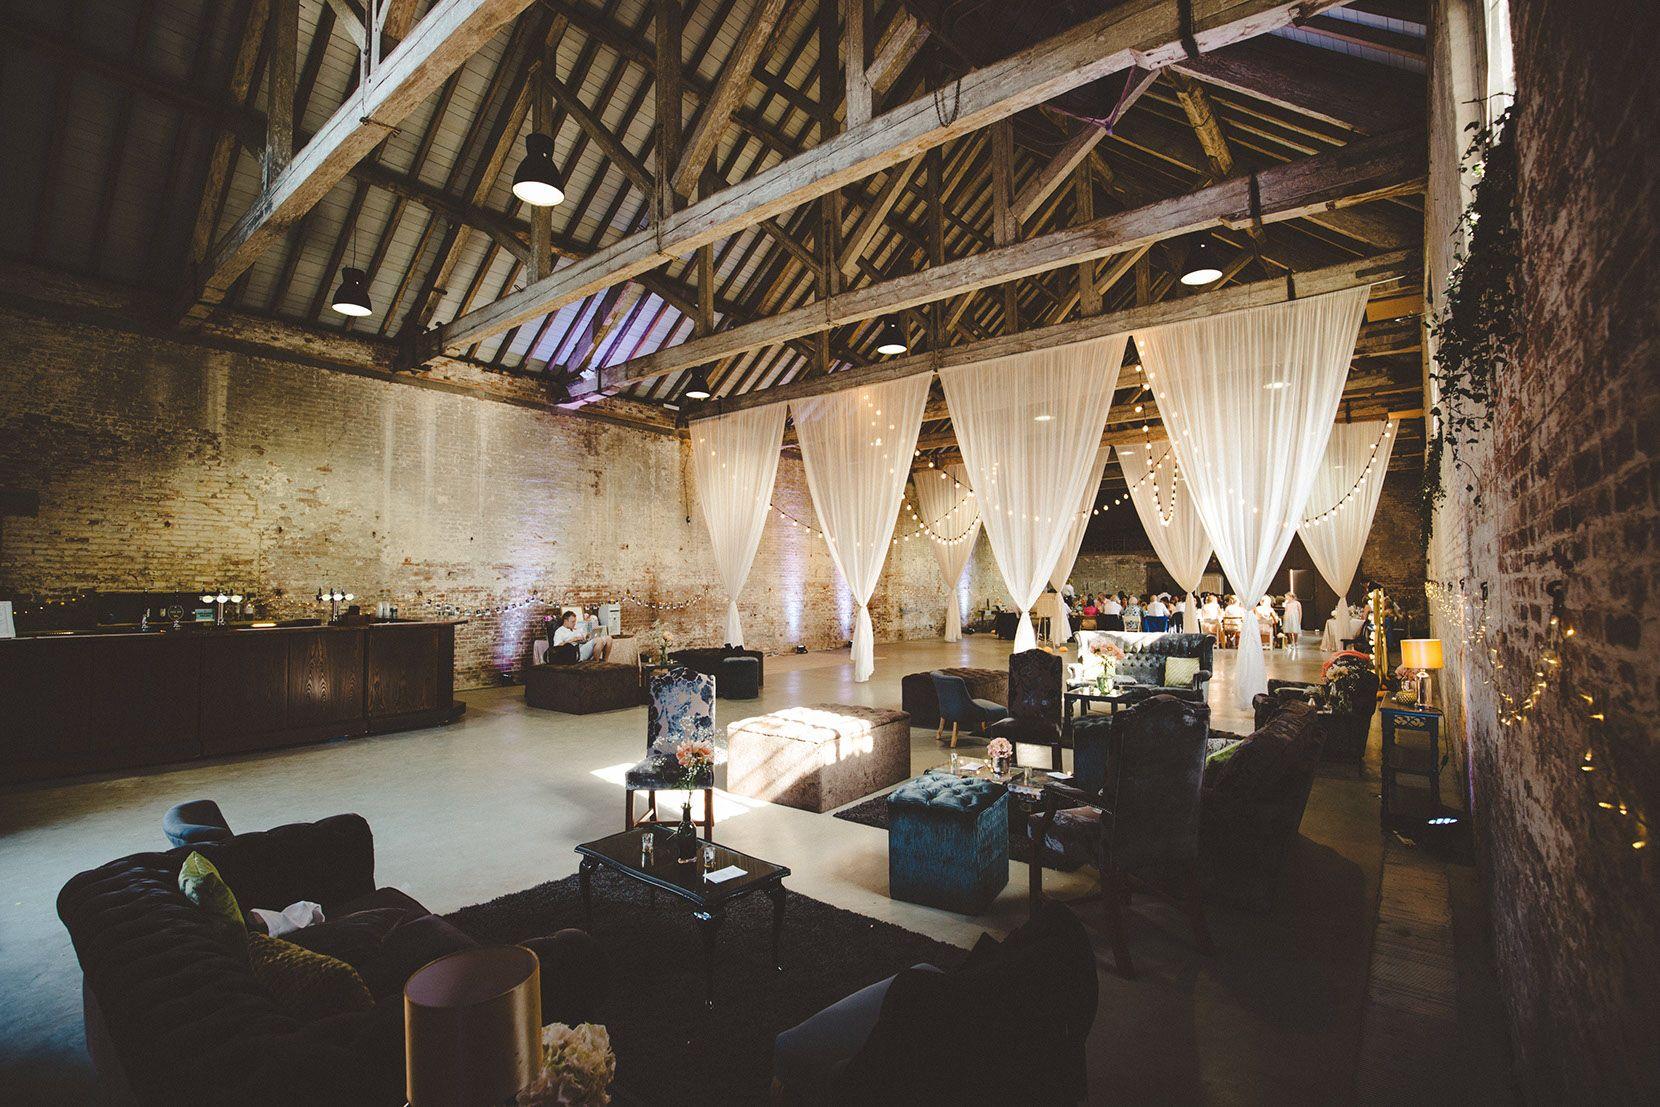 The Riding School Calke Abbey Derbyshire A Stunning Blank Canvas Wedding Venue Steeped